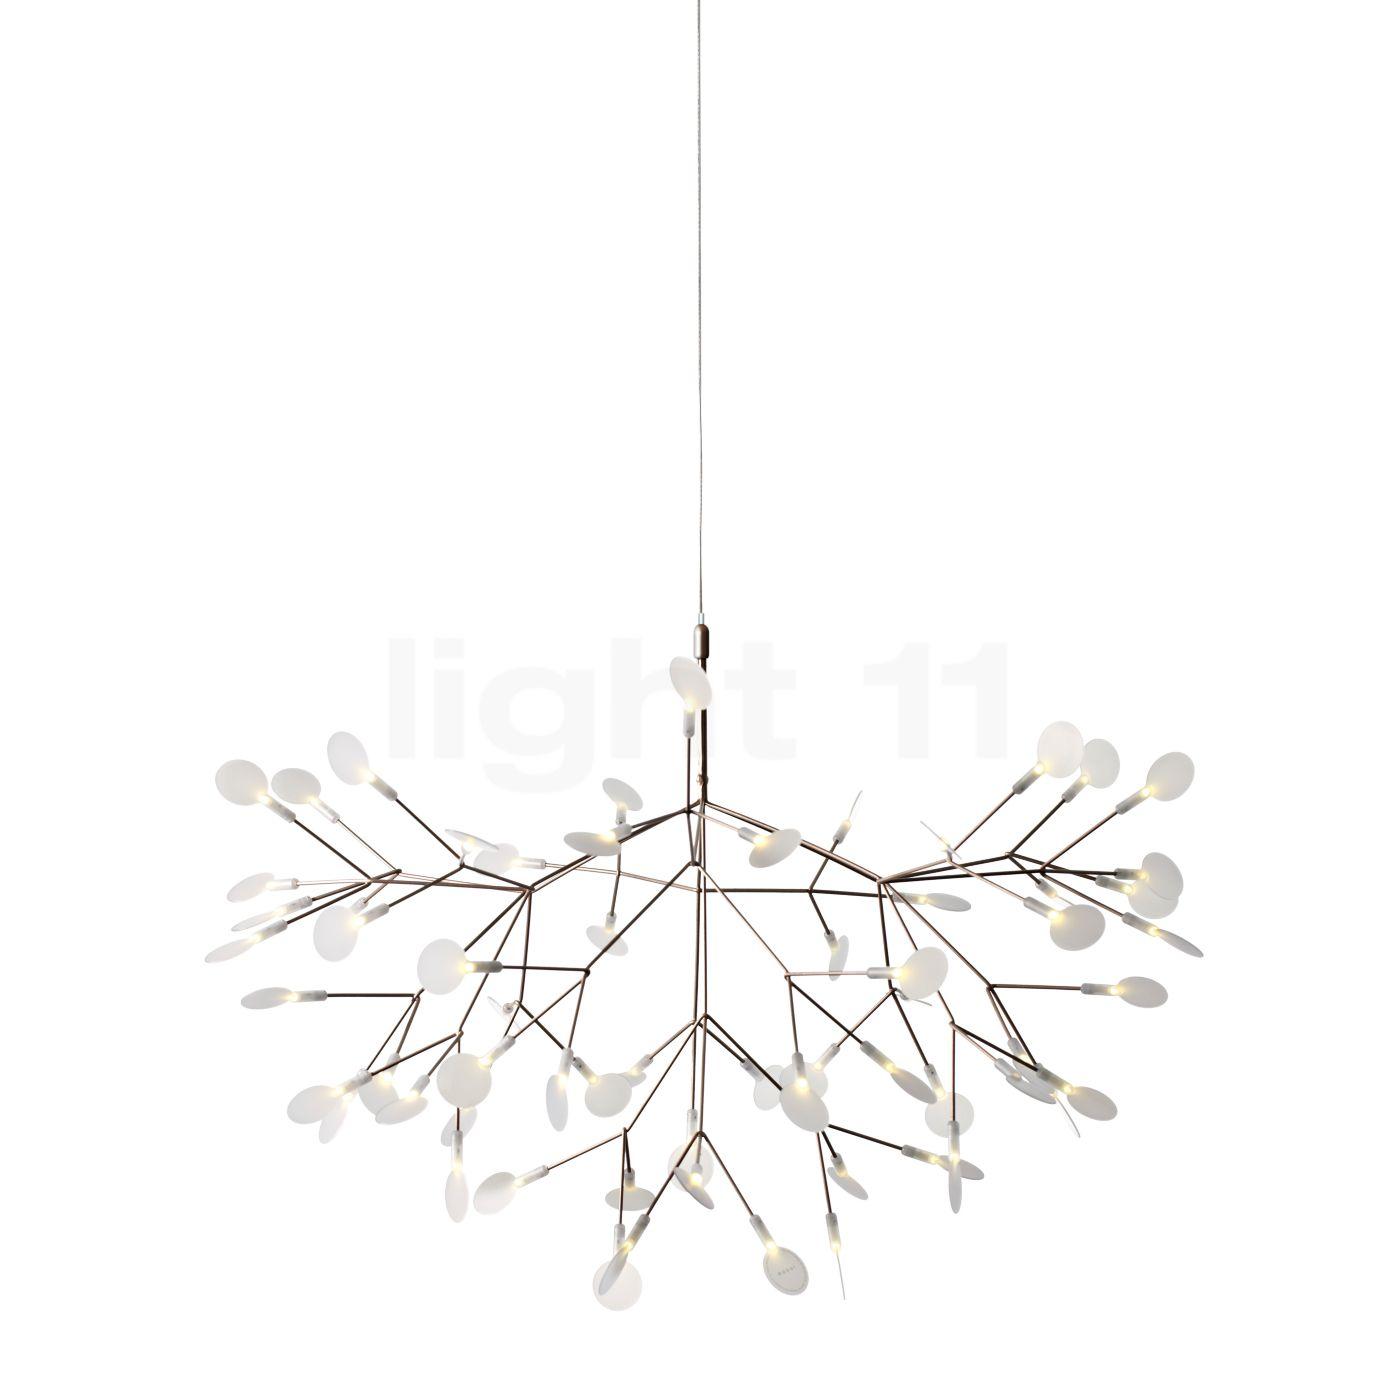 buy moooi heracleum ii pendant light small at light11 eu 12V Socket Wiring